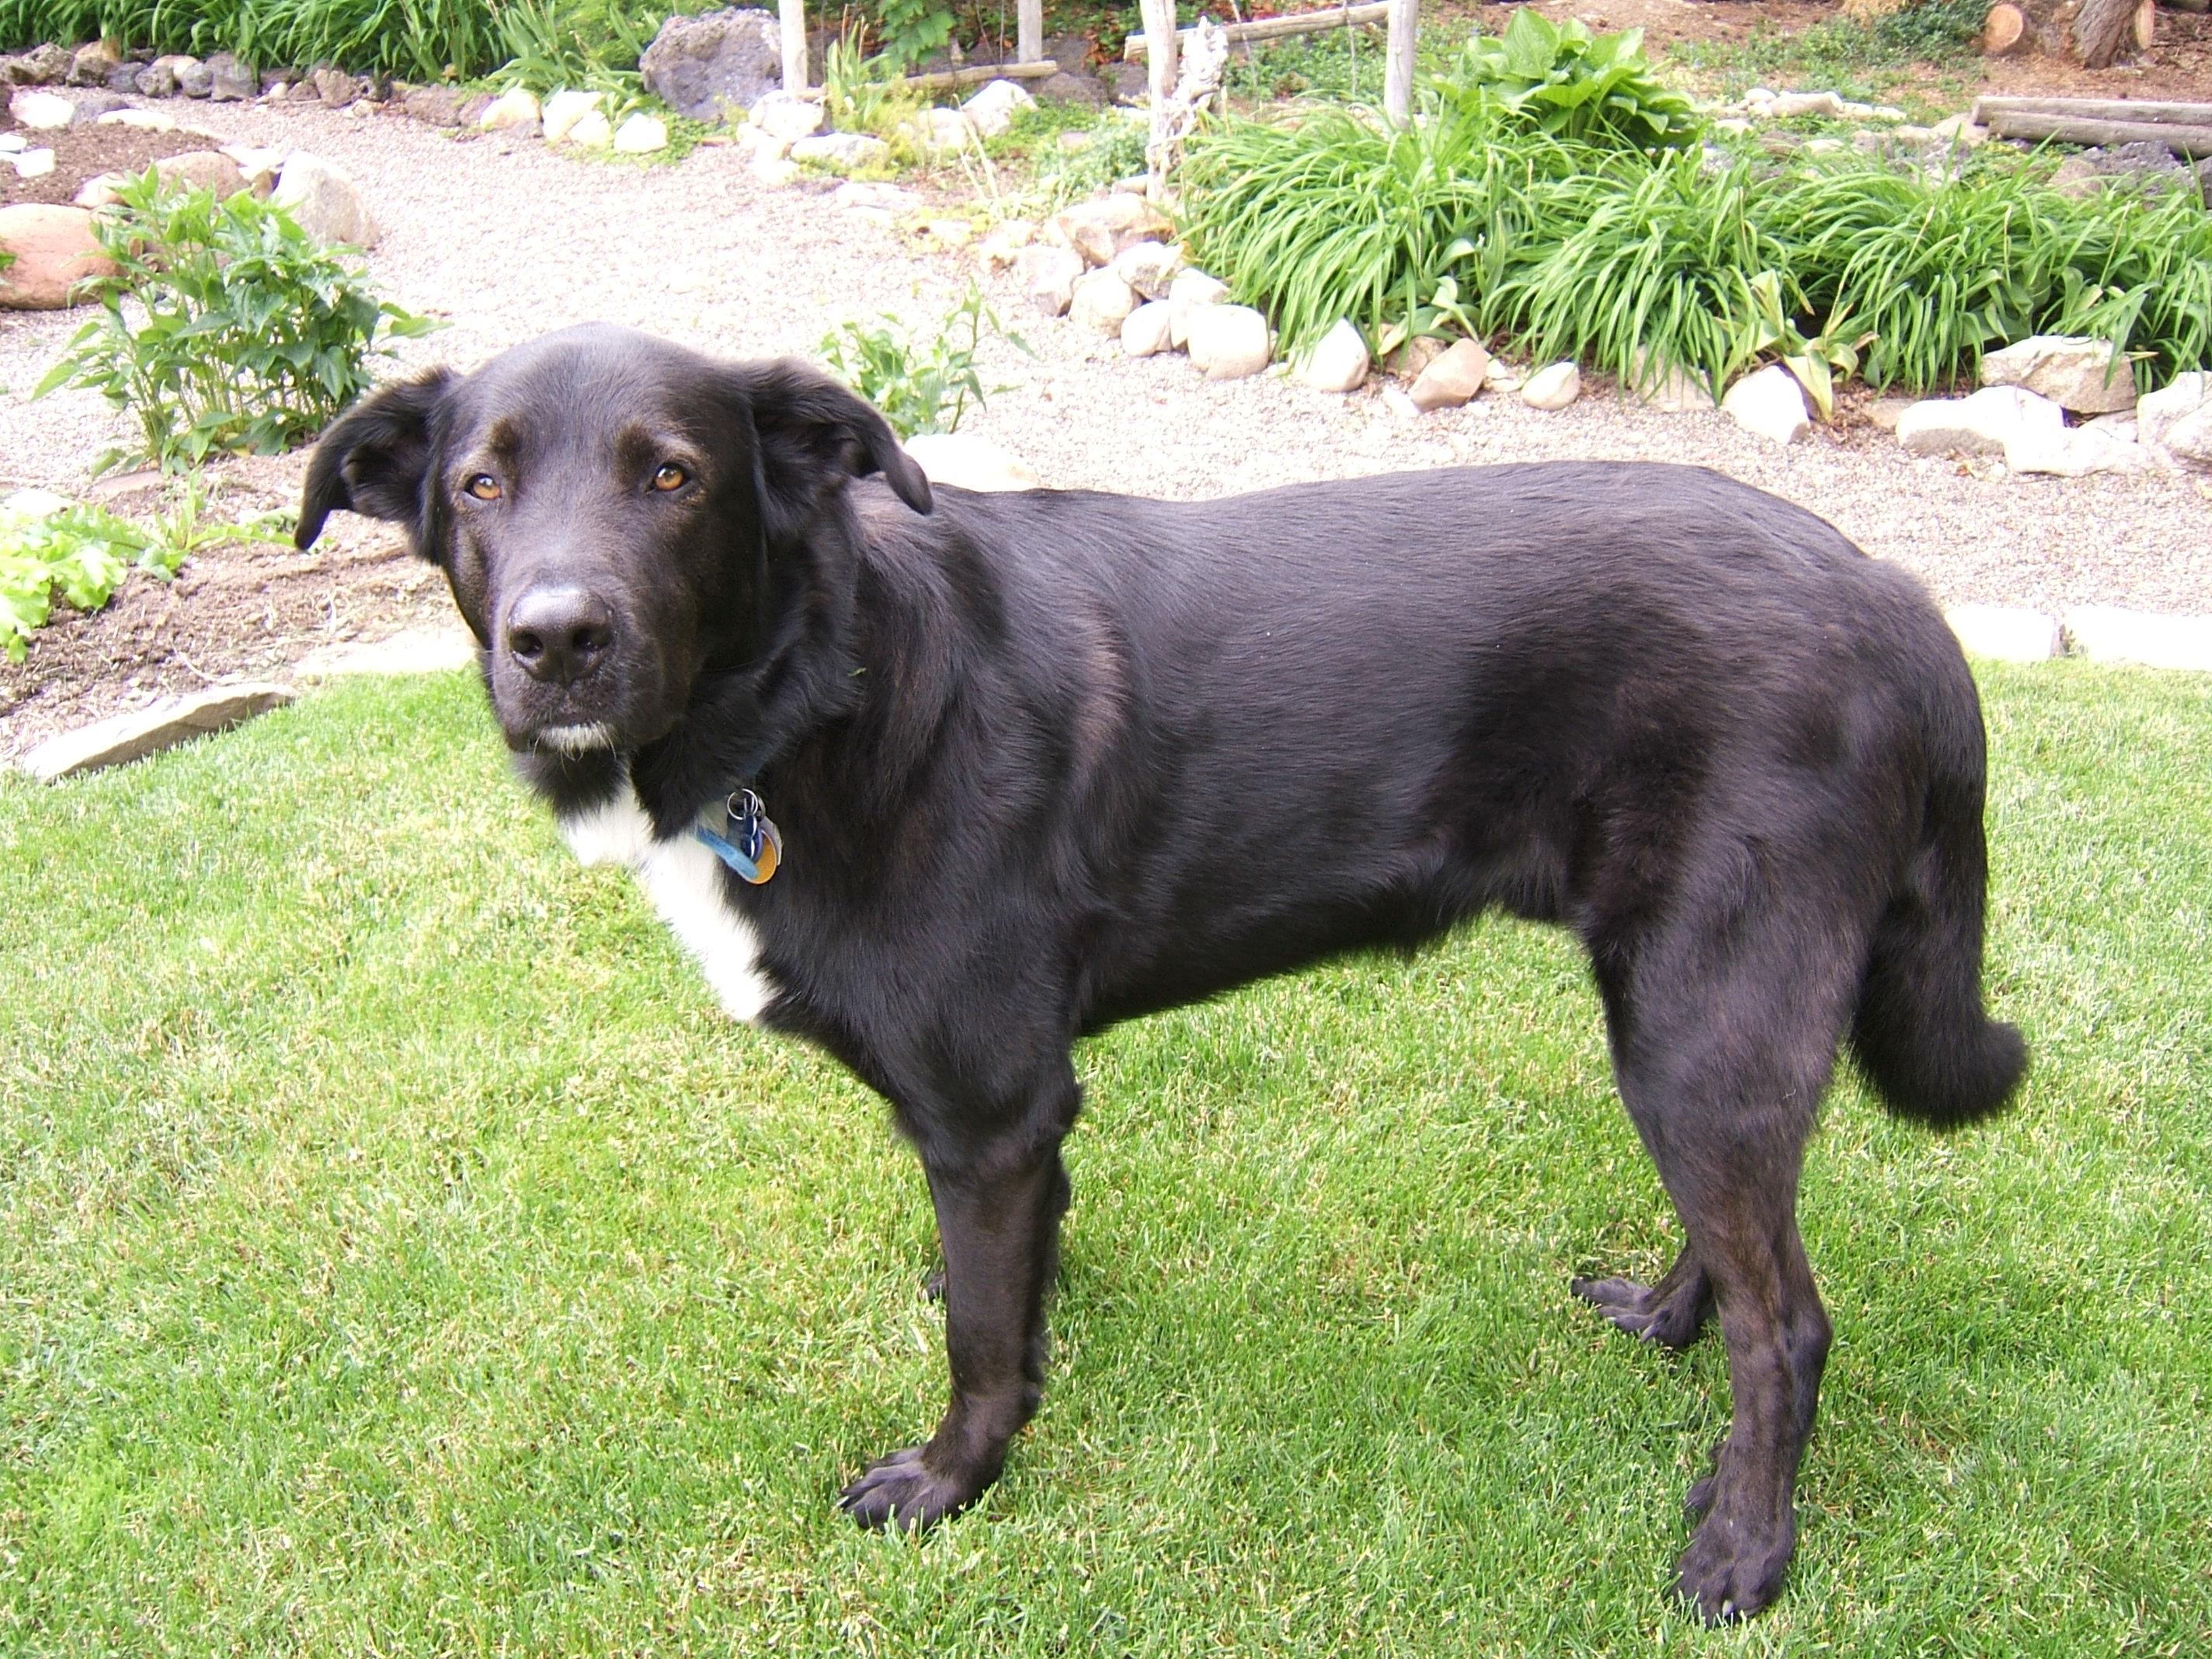 Big Black Dogs Big Enough To Eat People